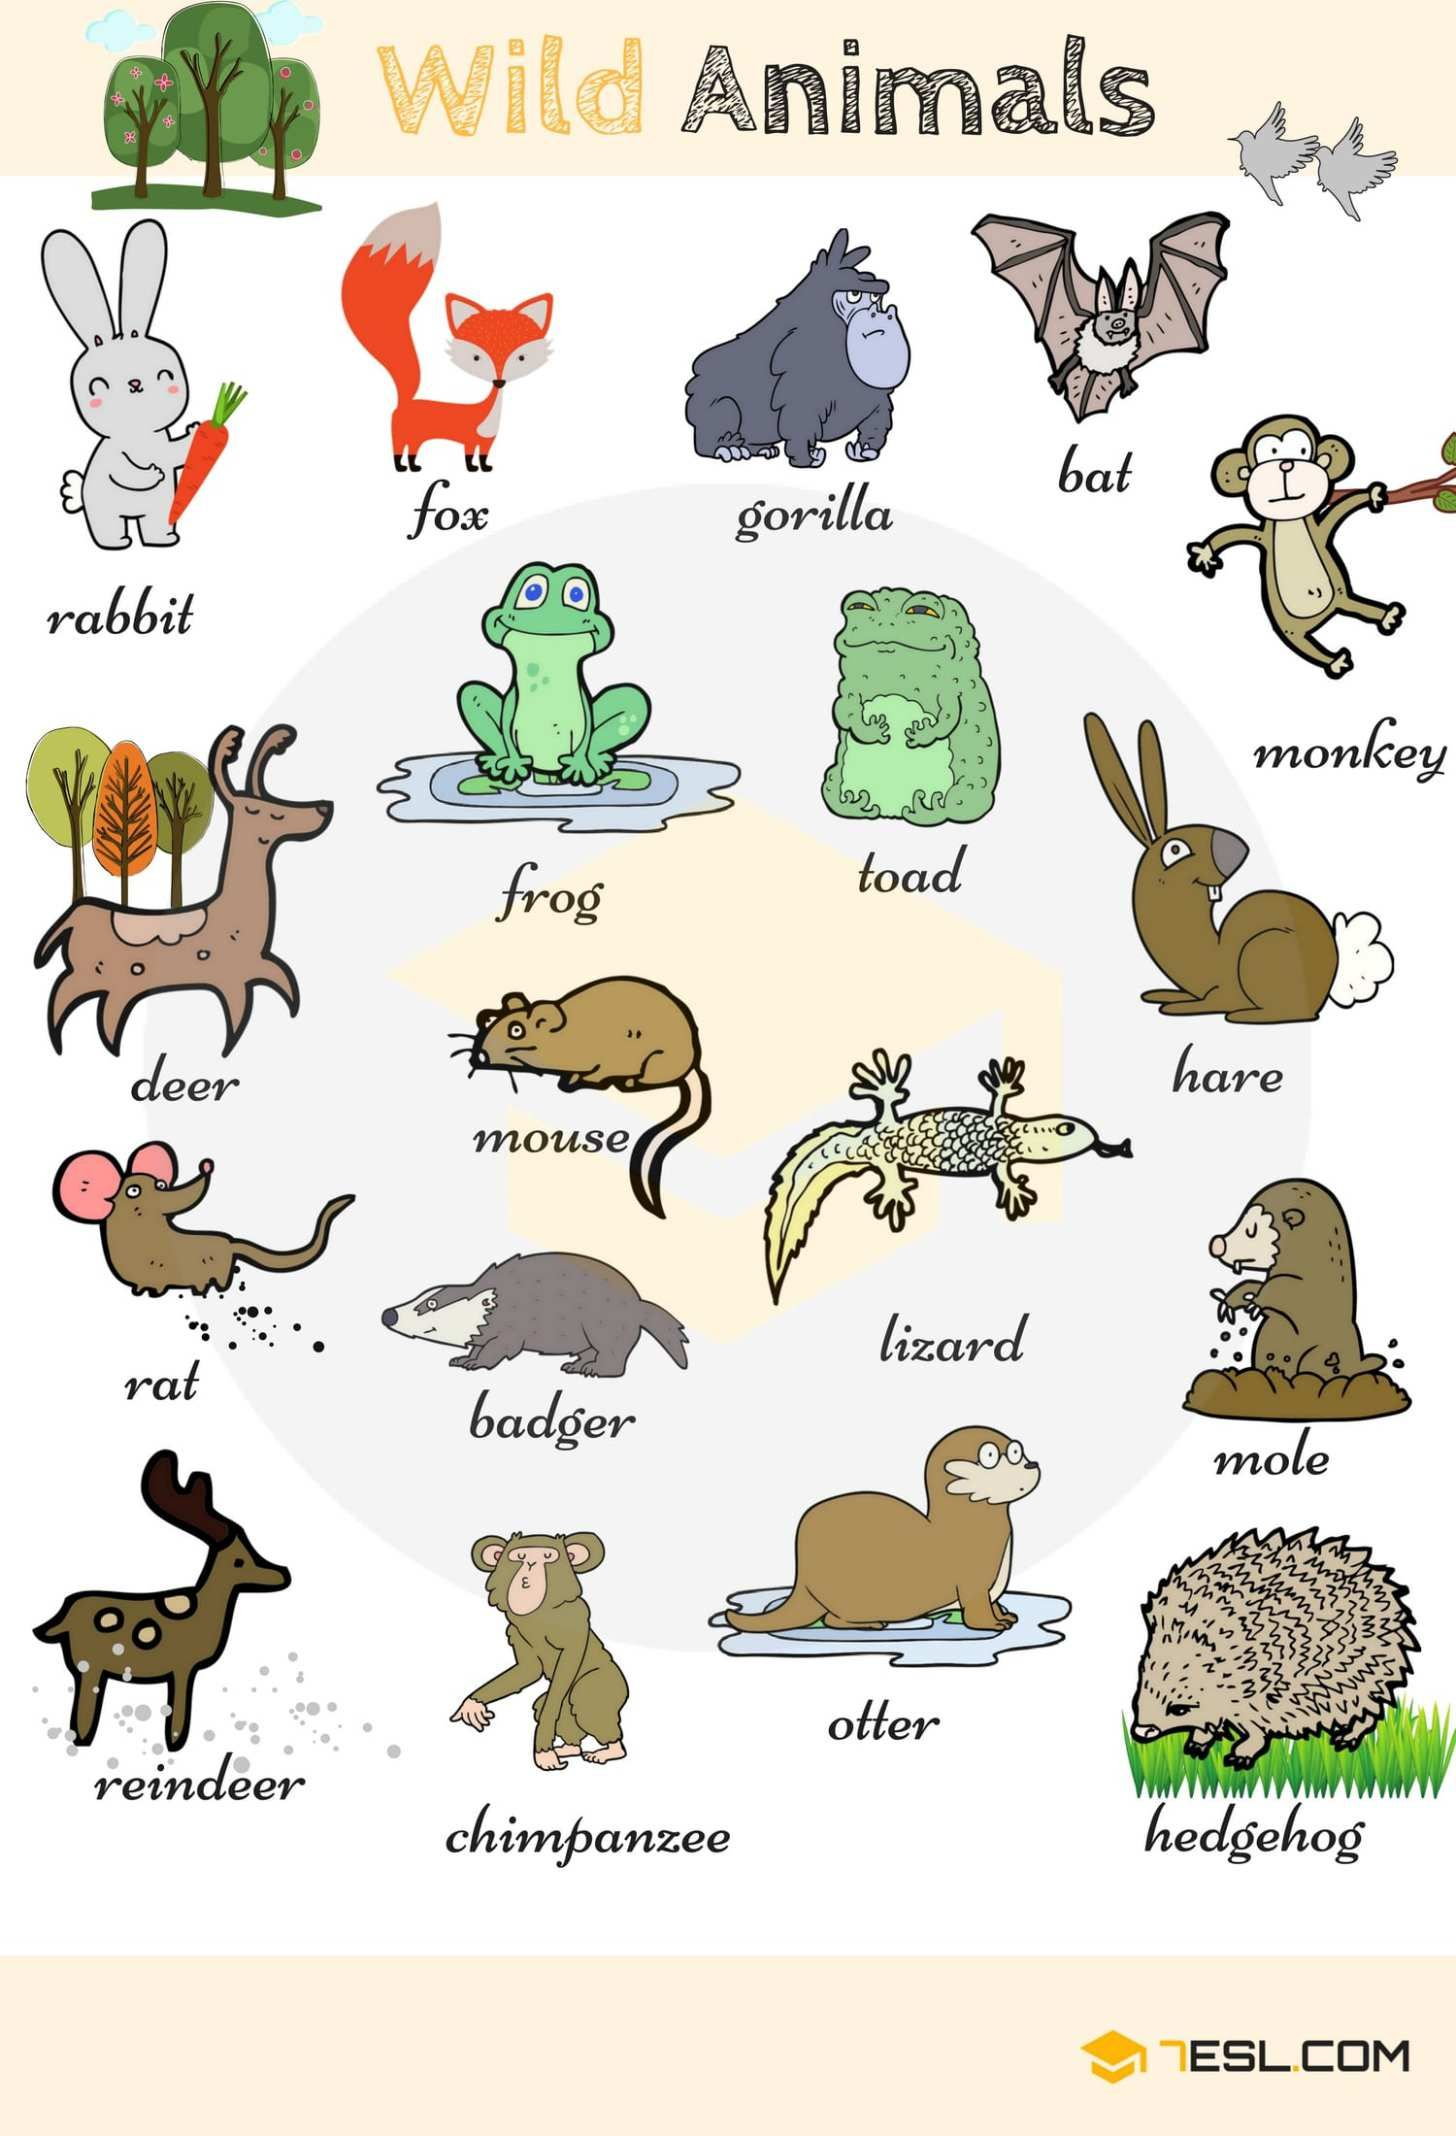 Learn Animal Names in English Английский язык, Изучать